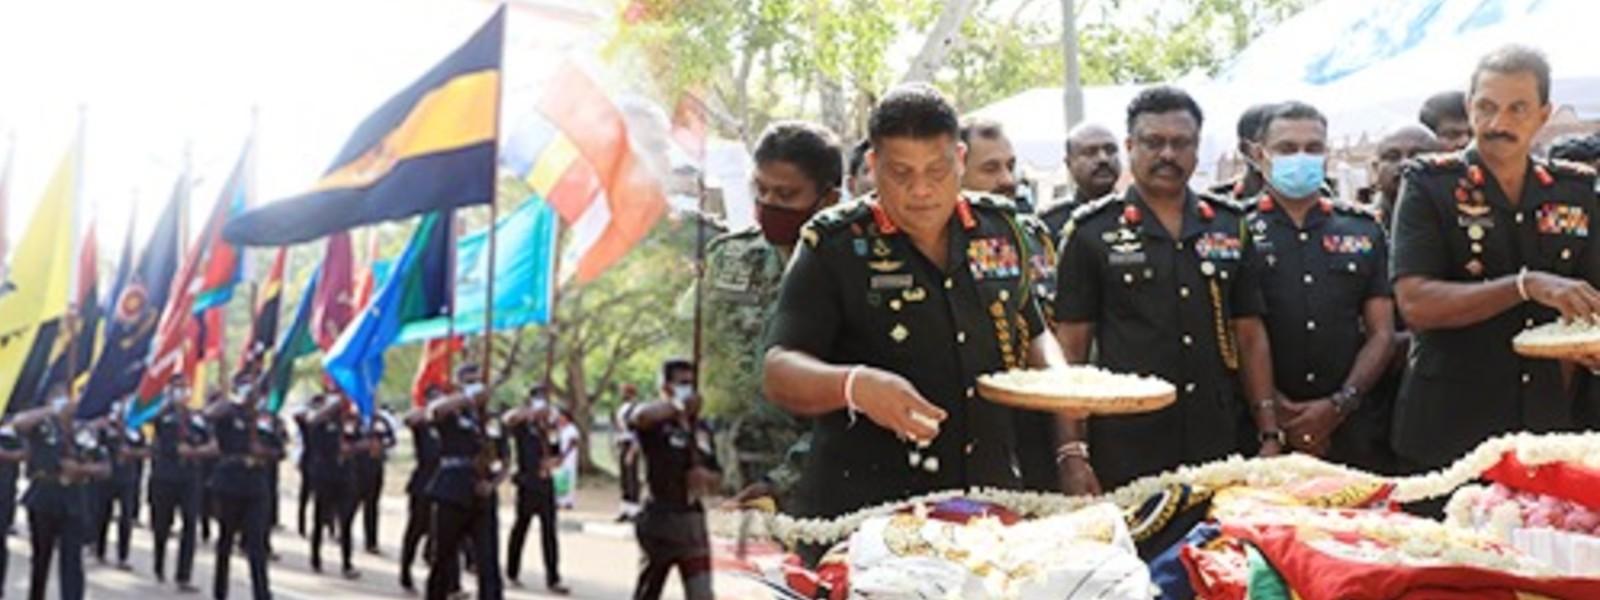 'Jaya Sri Maha Bodhi' Blessings Invoked Symbolically on Army Flags in Anuradhapura